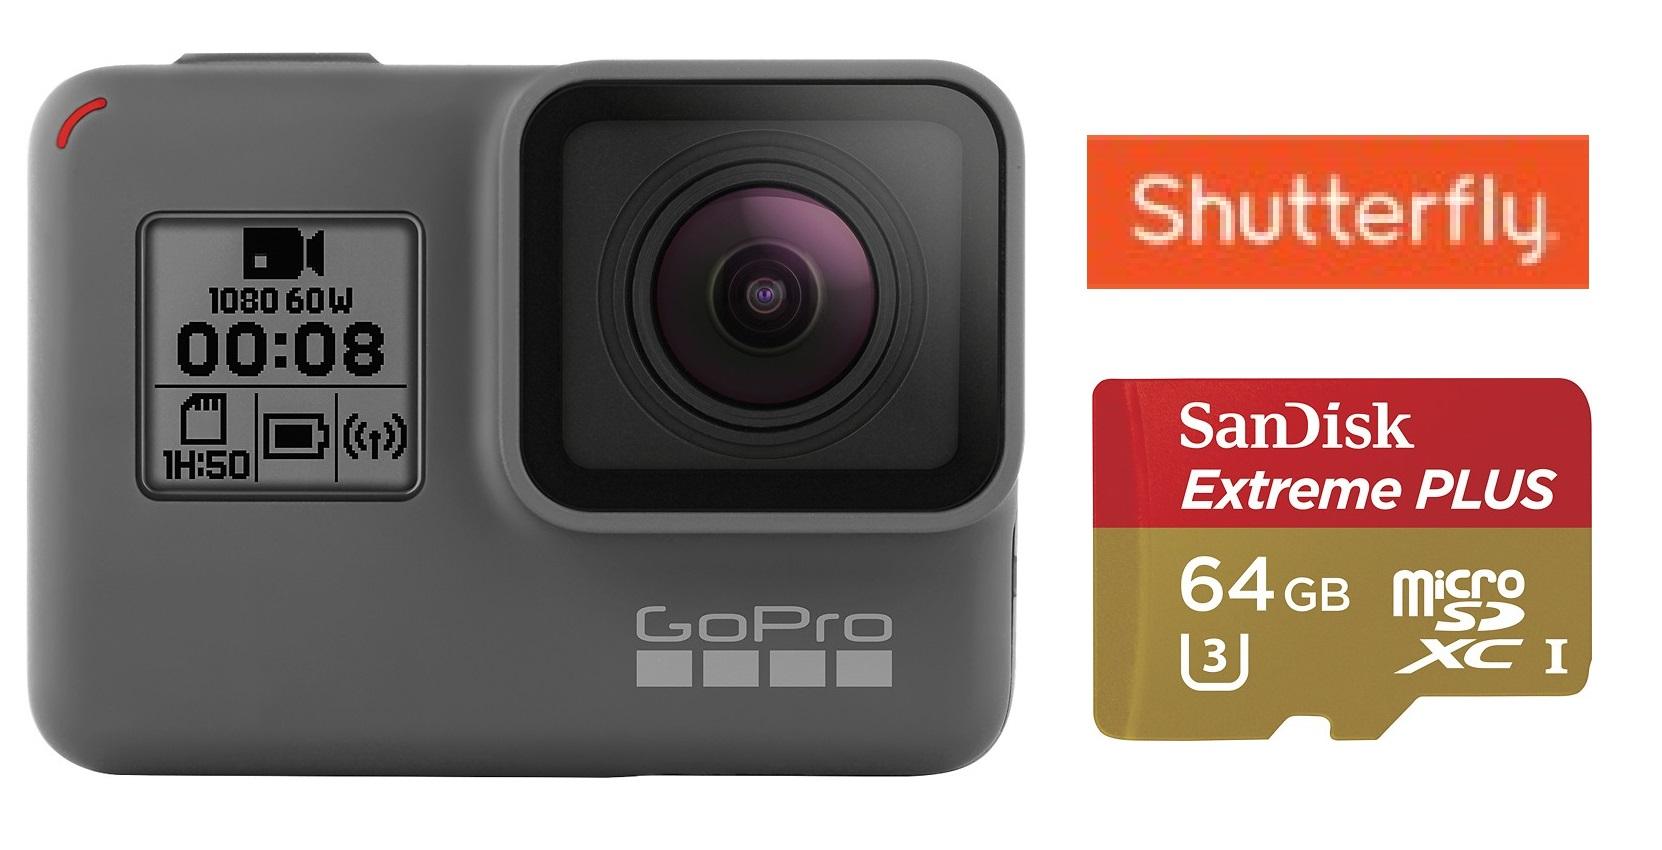 GoPro HERO5 Black 4K Action Camera + 64GB Sandisk Extreme Plus MicroSD Card  $400 & More + Free S&H